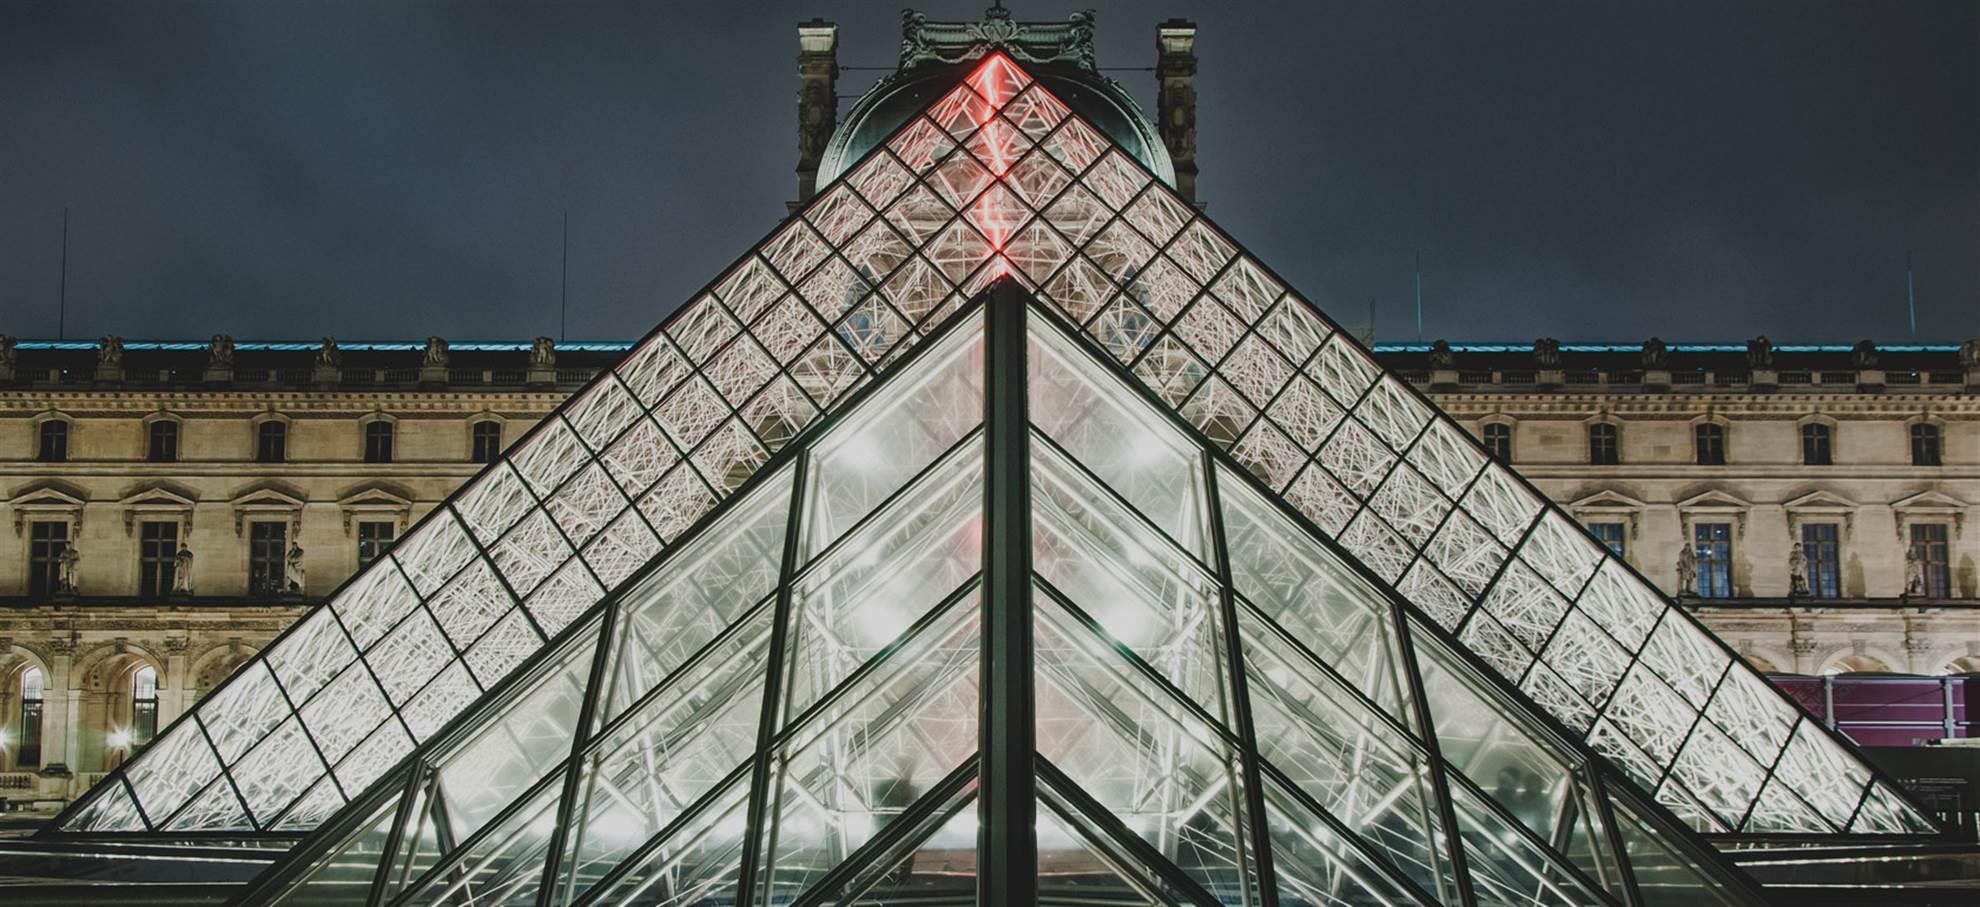 Museo del Louvre 'Evite las colas'